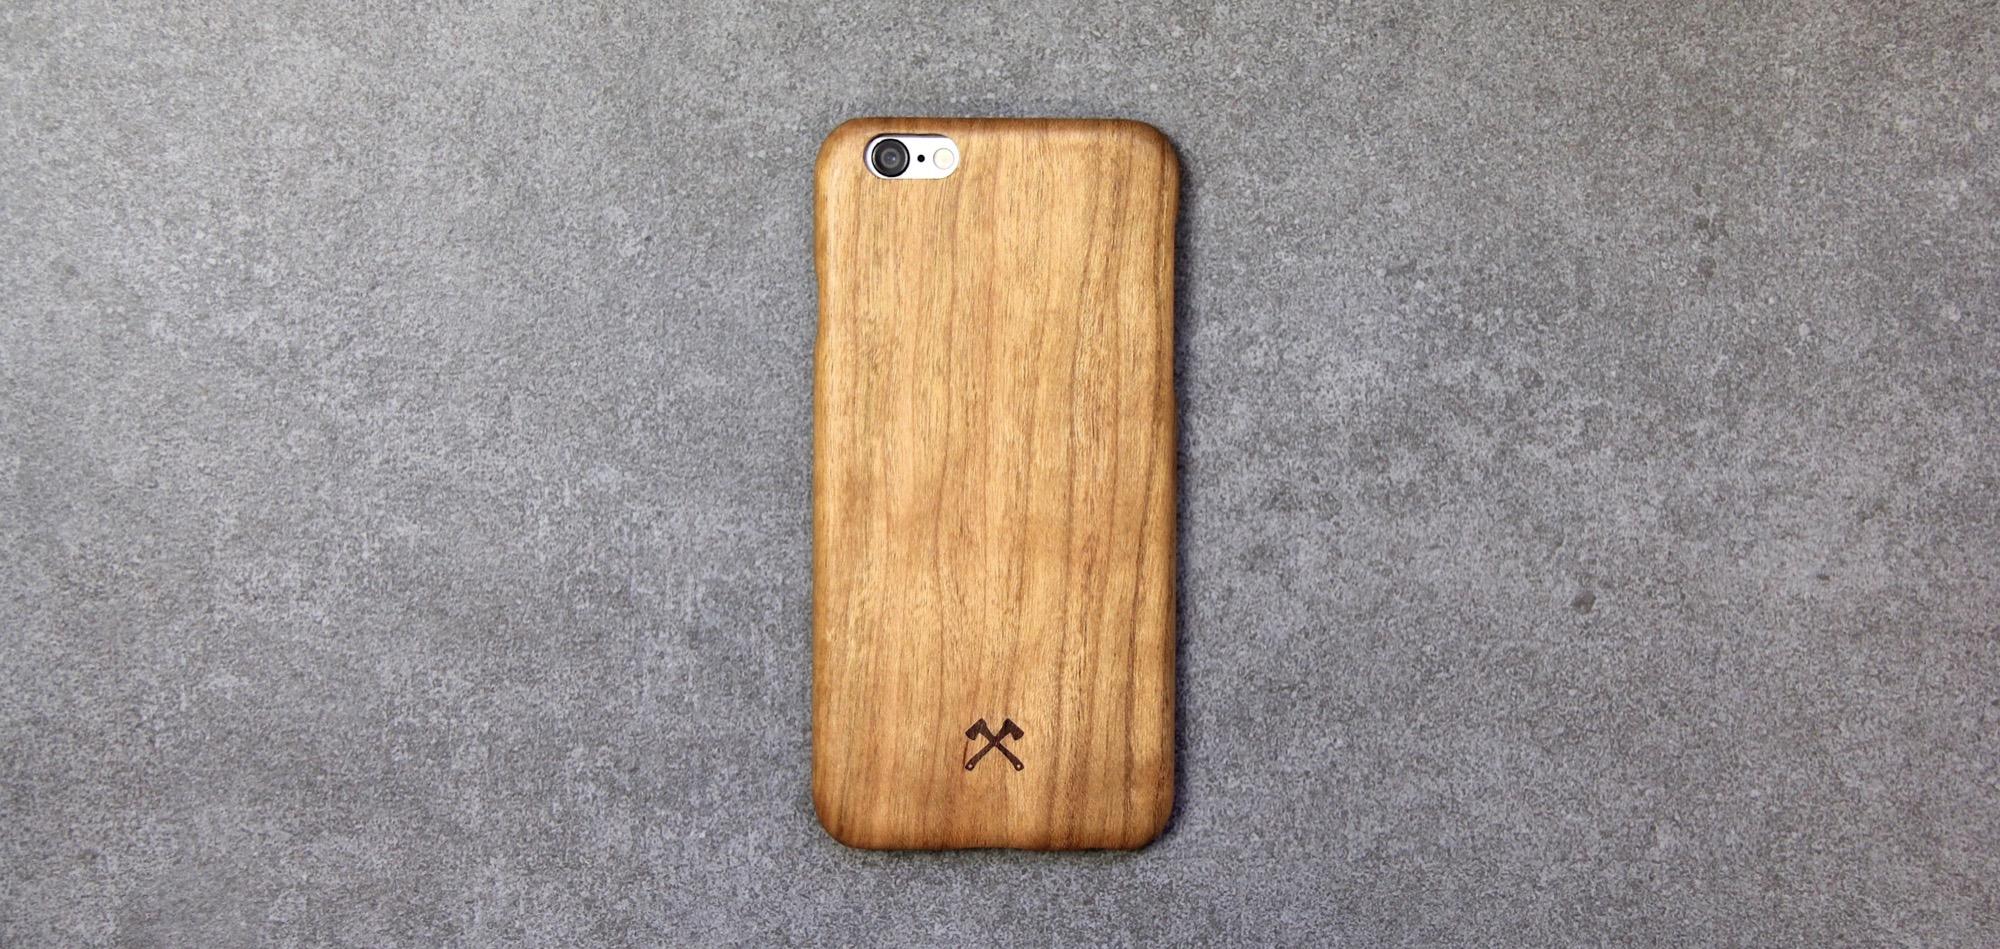 kevlar-holz-iphone-7-case-holzcase-huelle-schlank-wood-duenn-leicht-schutzhuelle-schutz-stabilfolie5